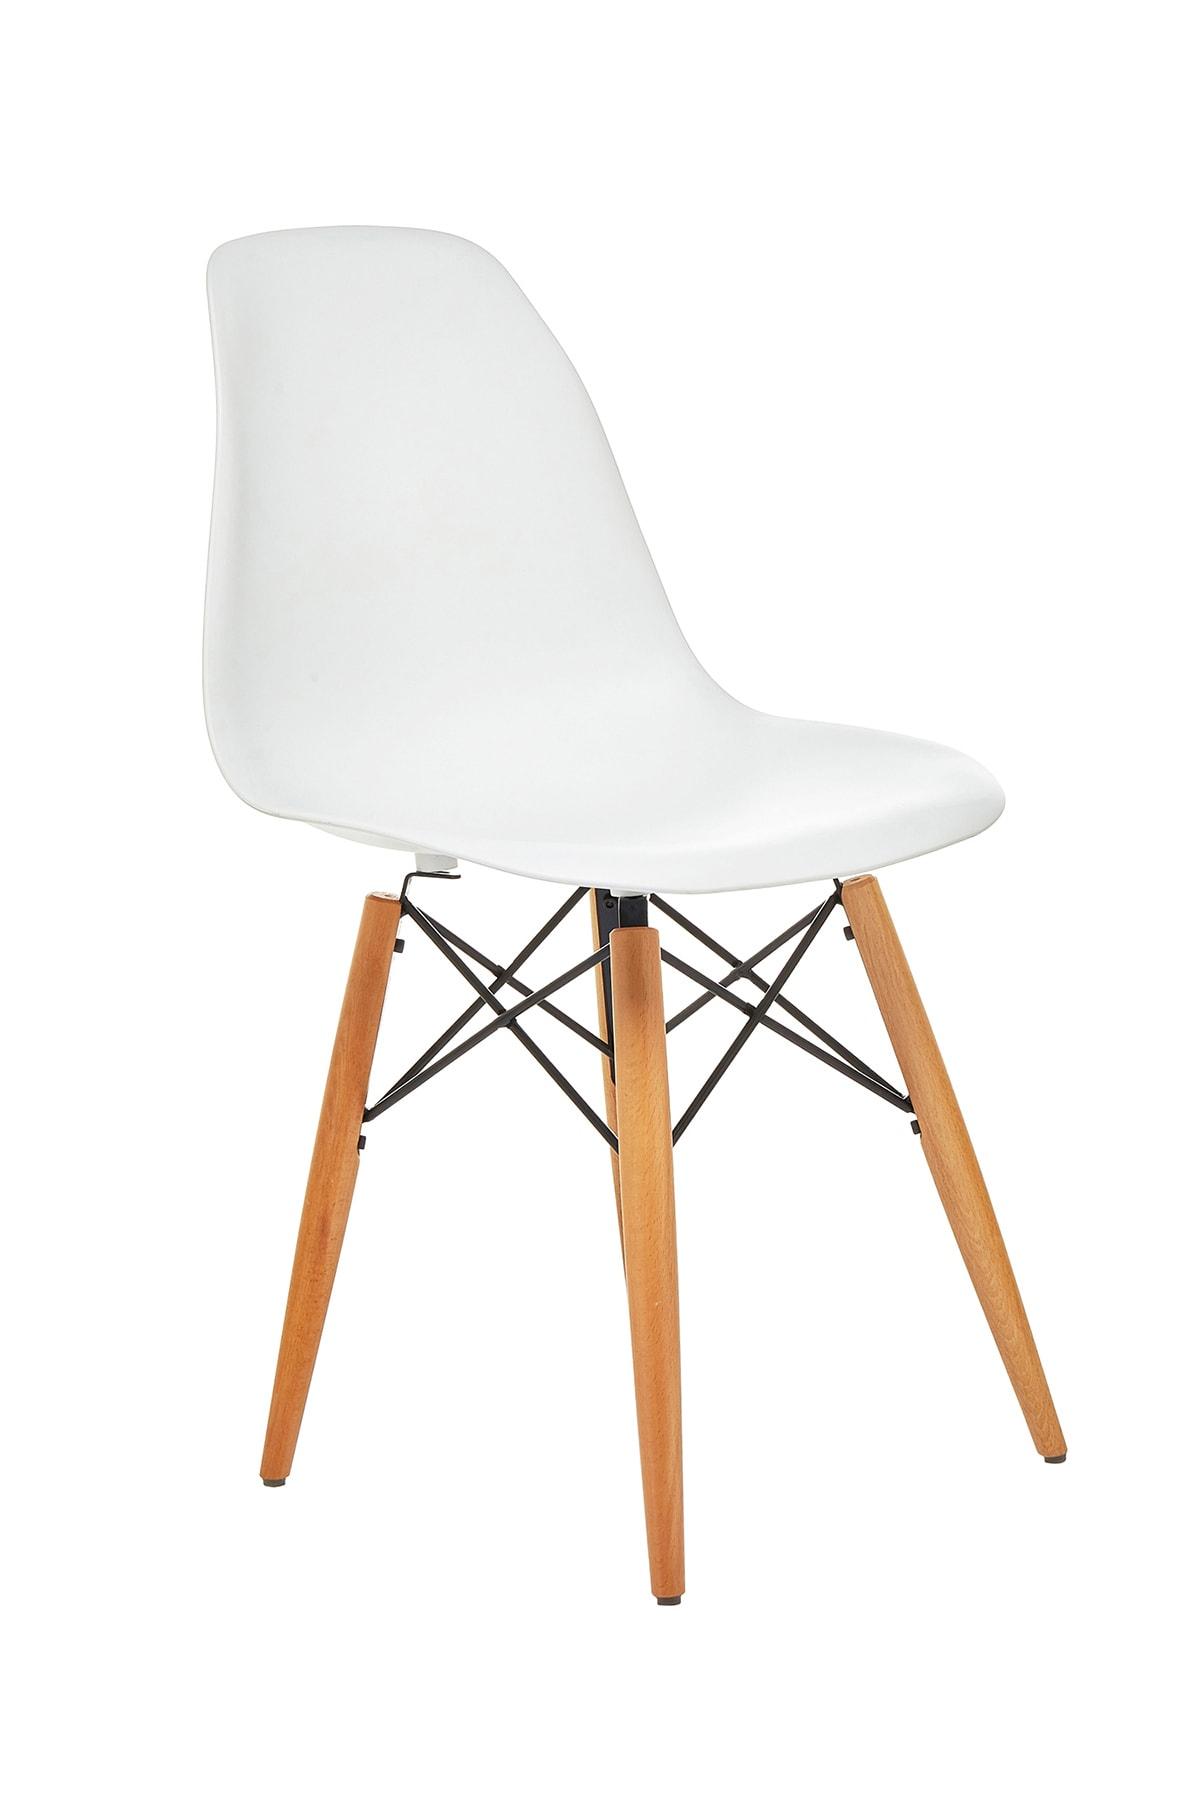 Seduna Beyaz Eames Sandalye Natural Ahşap Ayaklı   2 Adet 2